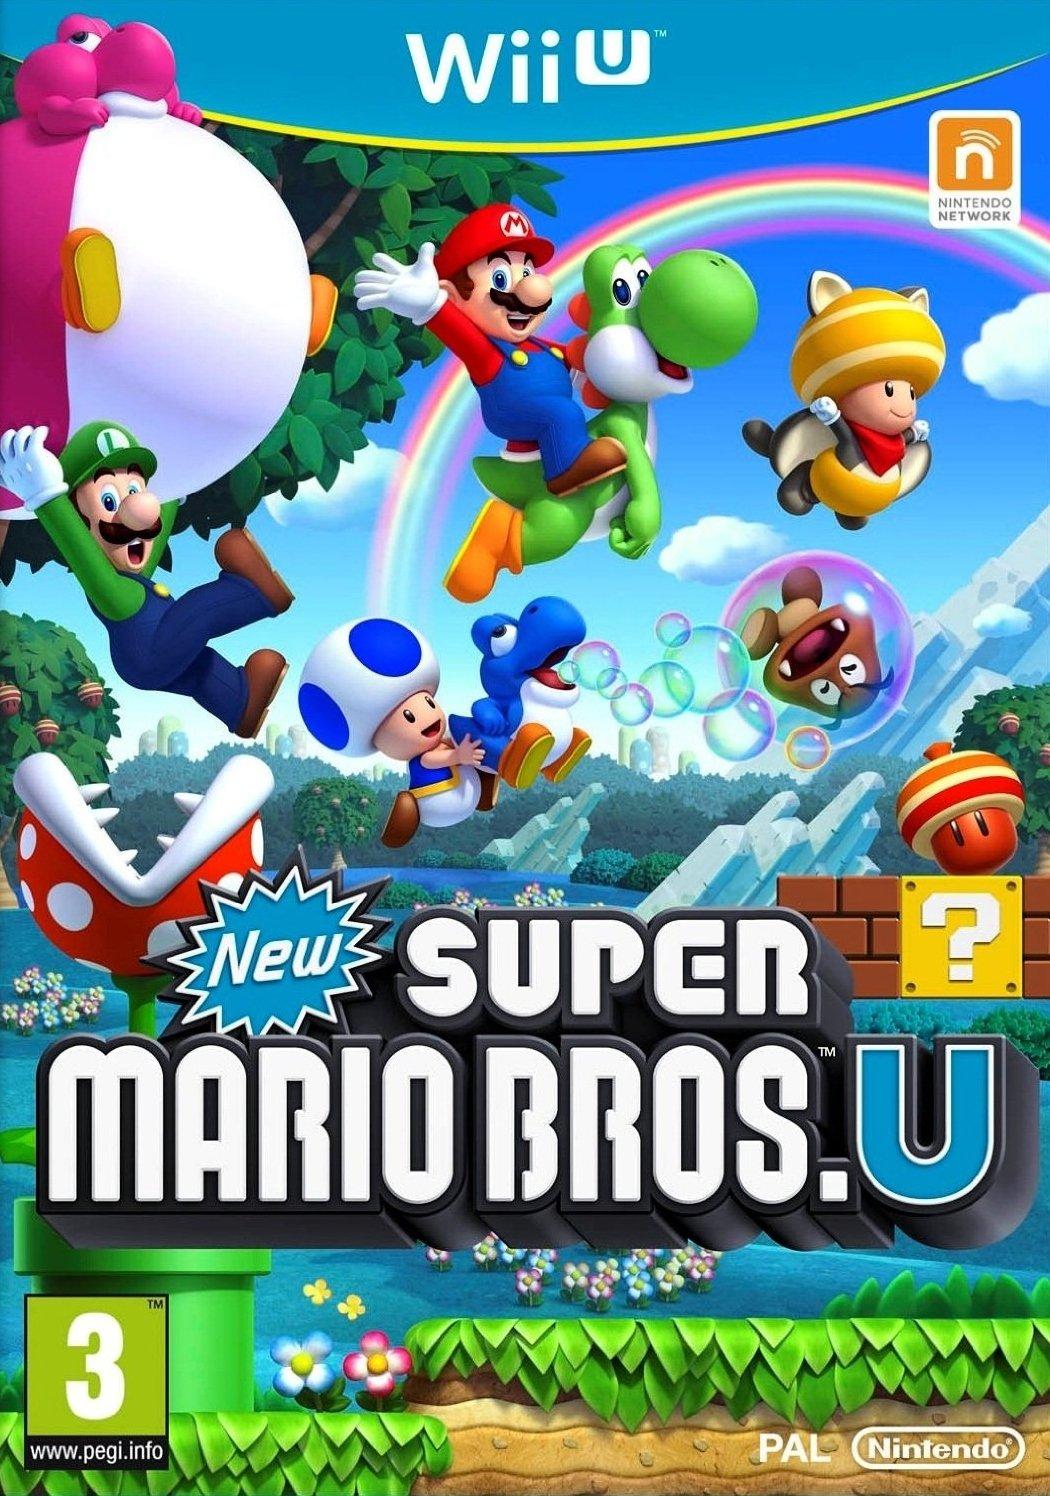 NewSuperMarioBros.U Wii U Jaquette 002